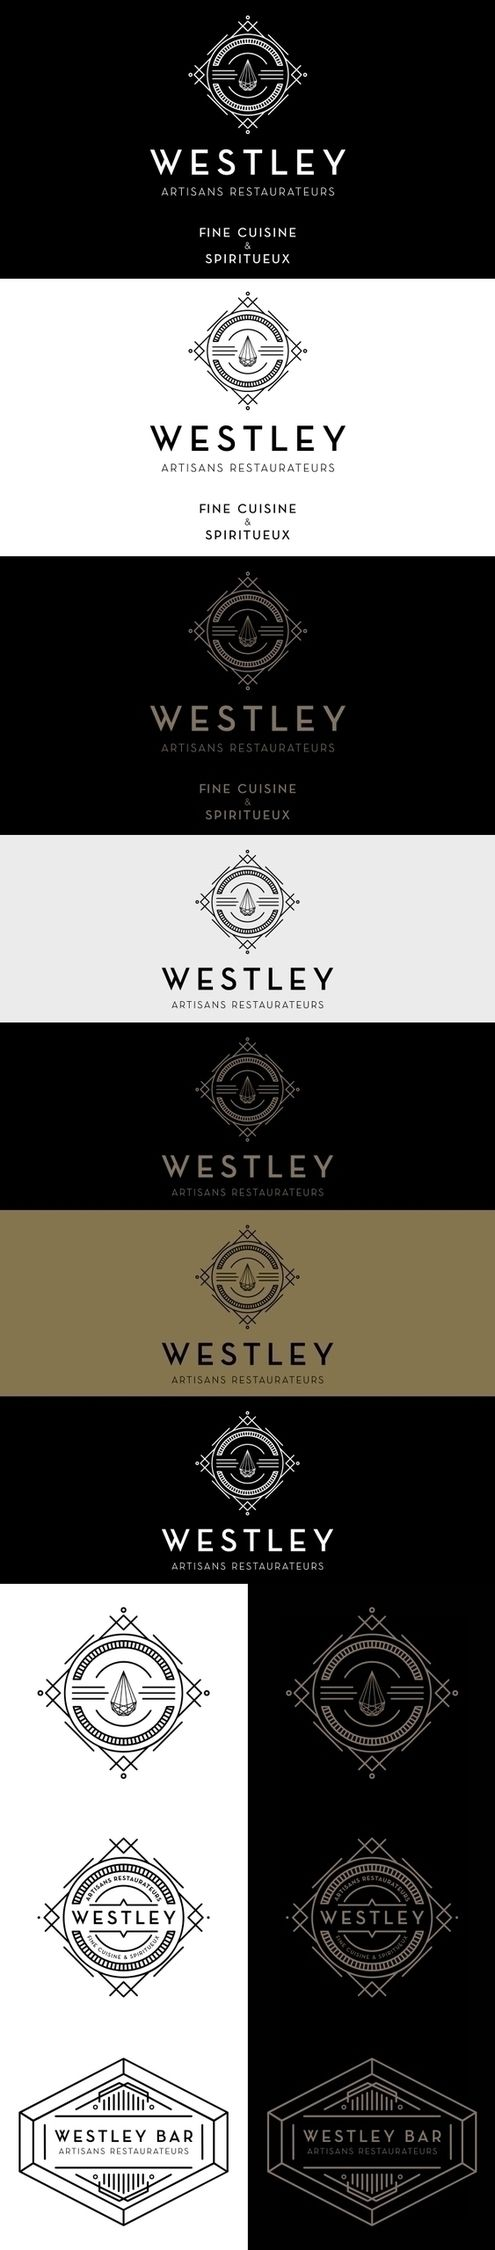 Westley Artisans Restaurateur  - fjopus7 | ello